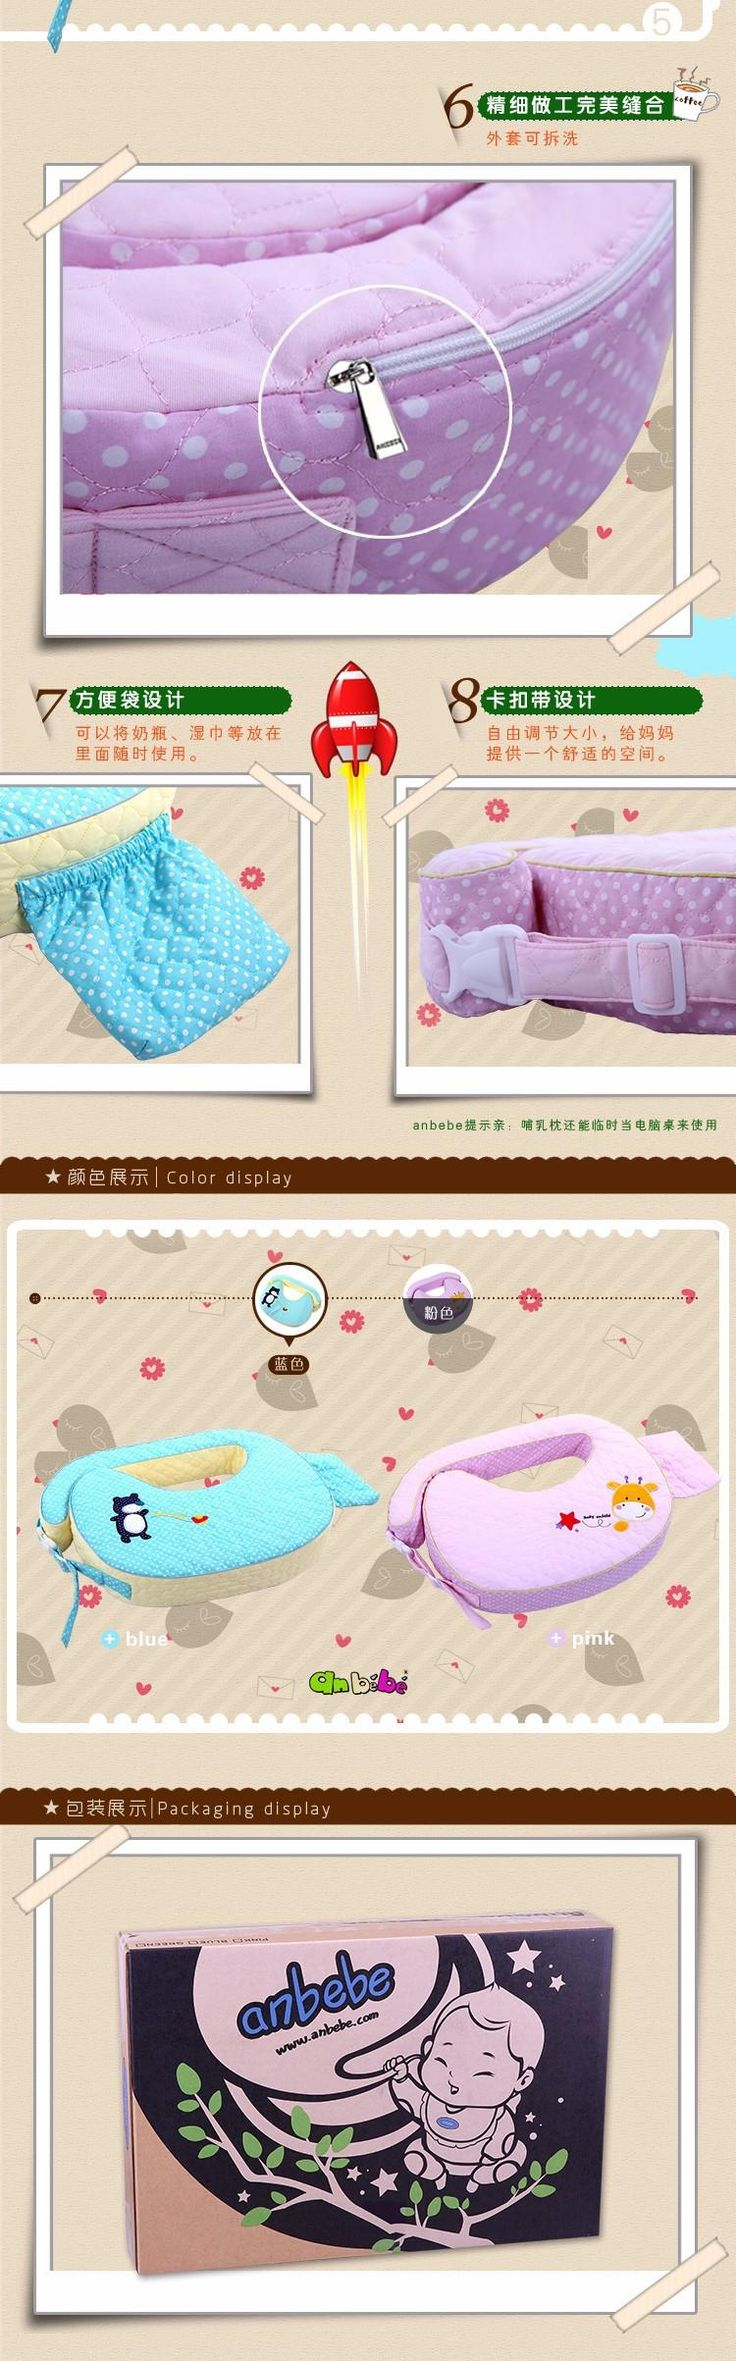 High quality Anbebe Baby Feeding Pillow multifunctional Infant Nursing Pillow Maternal Cushion Gift for Newborn